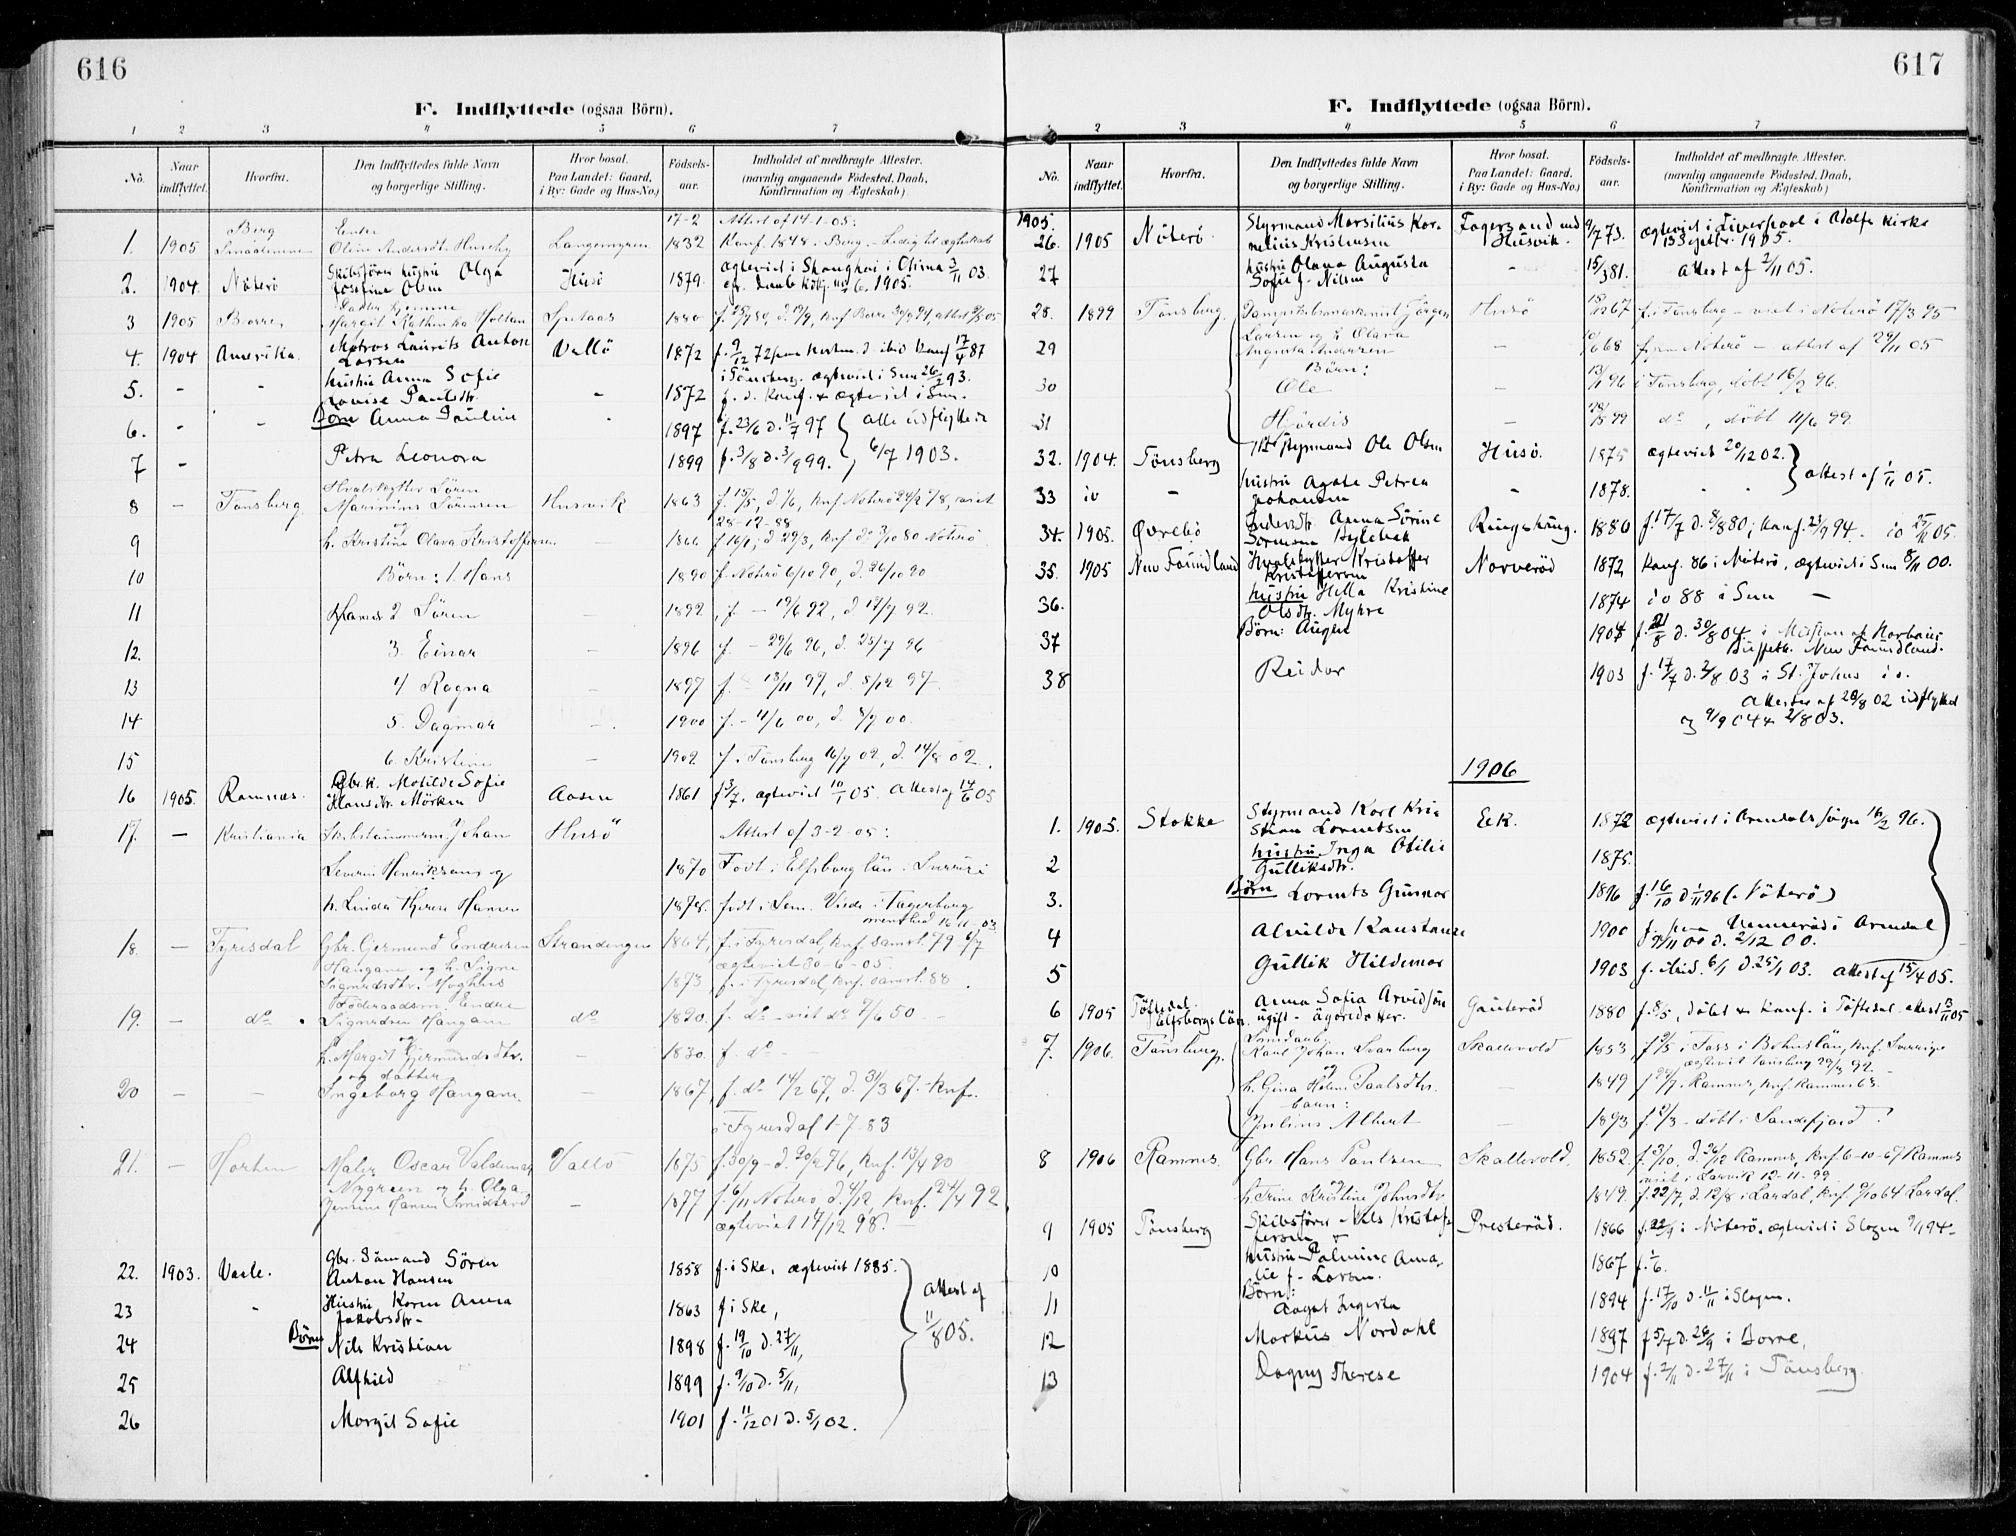 SAKO, Sem kirkebøker, F/Fb/L0006: Ministerialbok nr. II 6, 1905-1918, s. 616-617